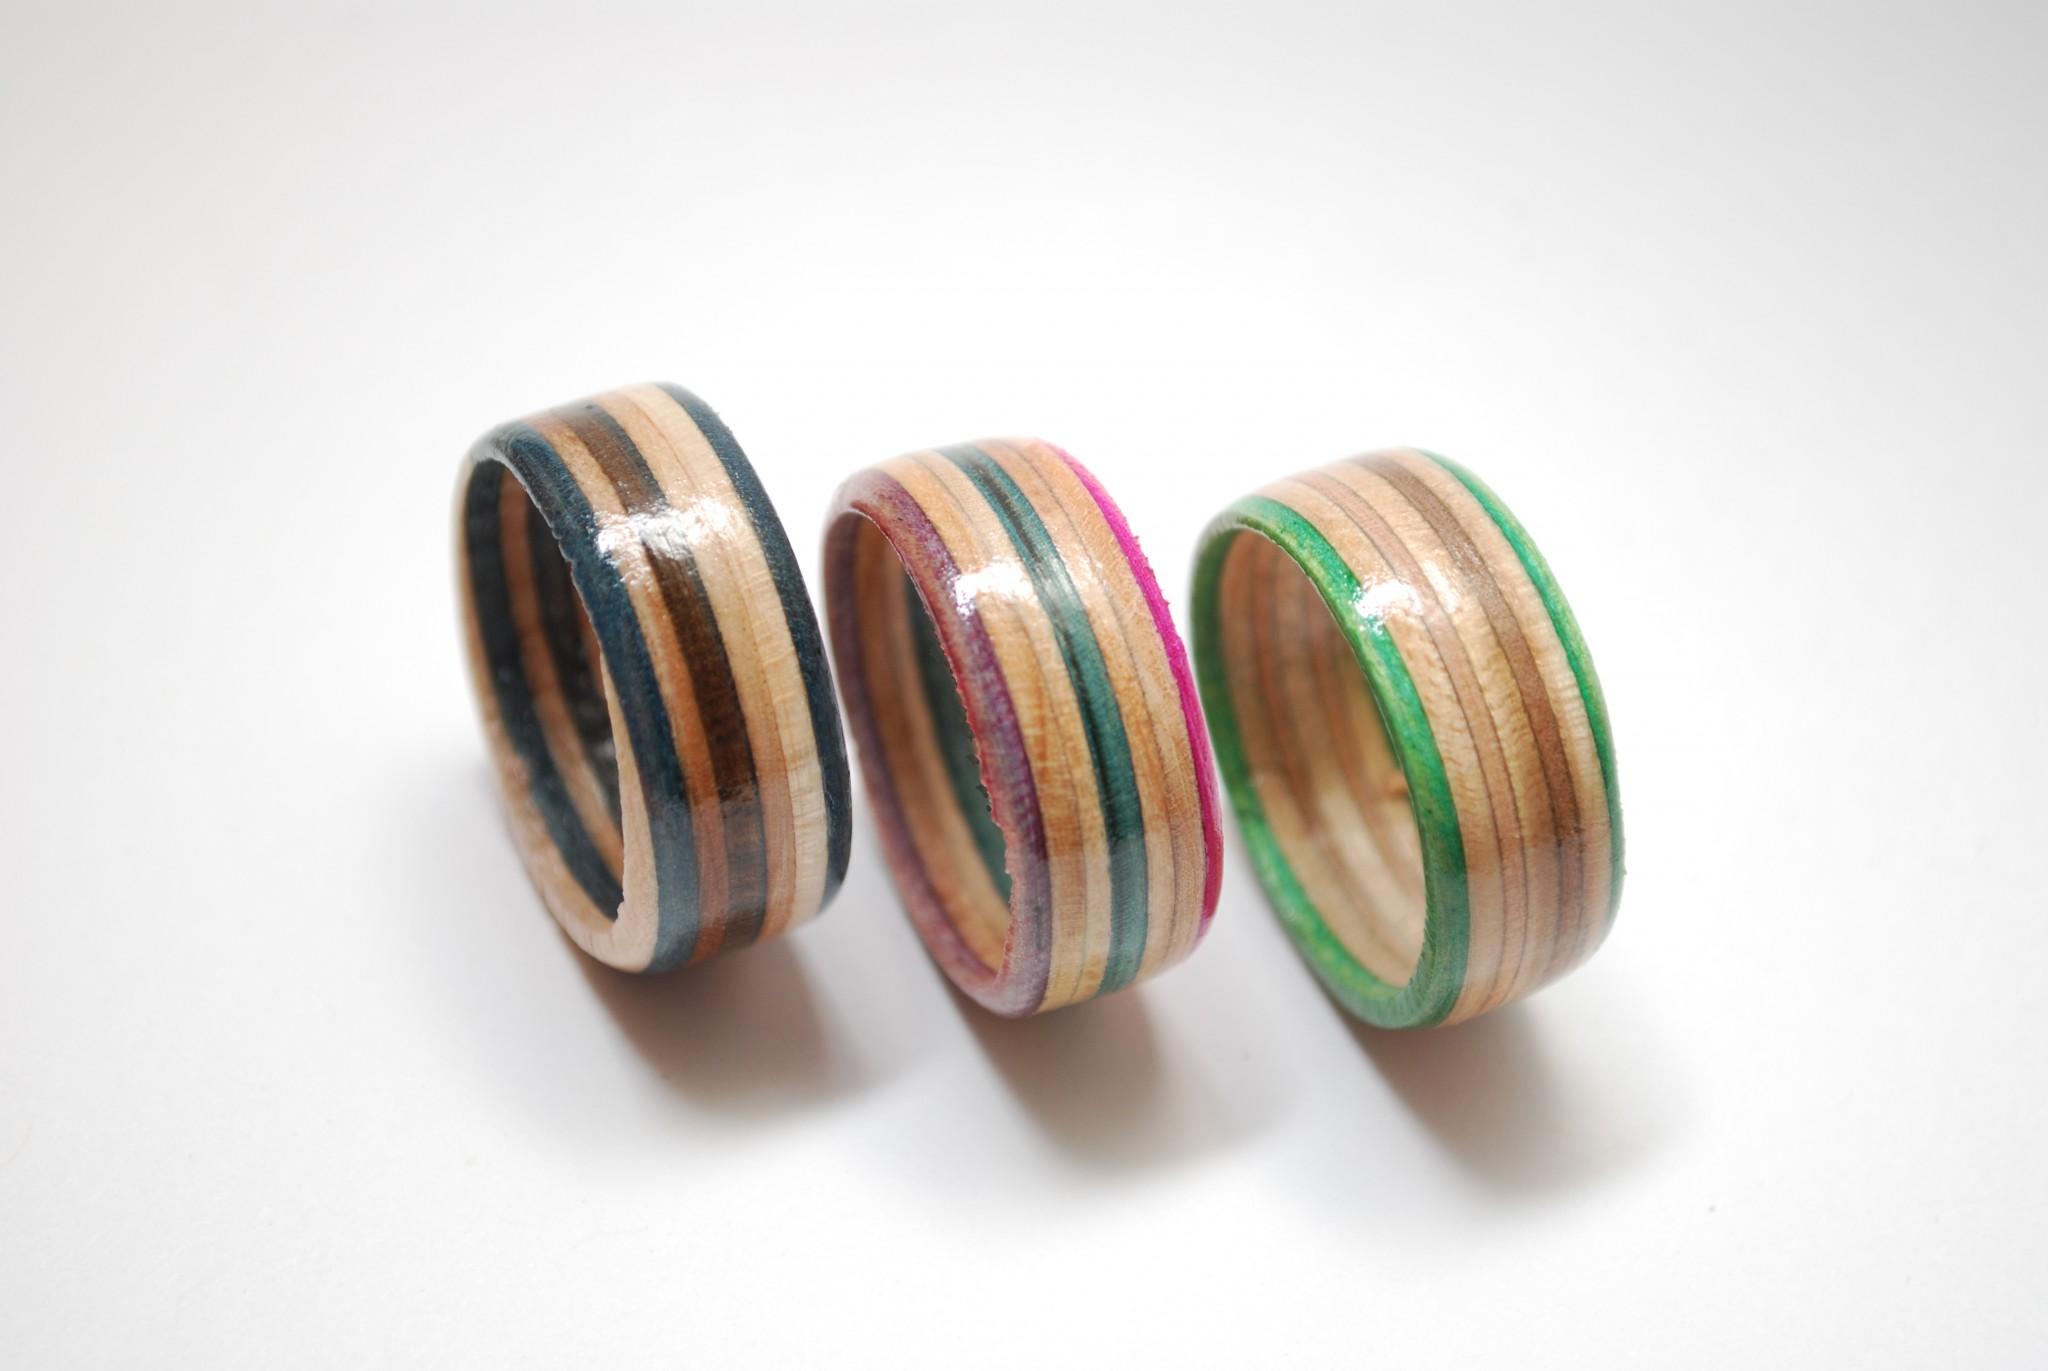 skateboard ring, skate ring, recycled, upcycled